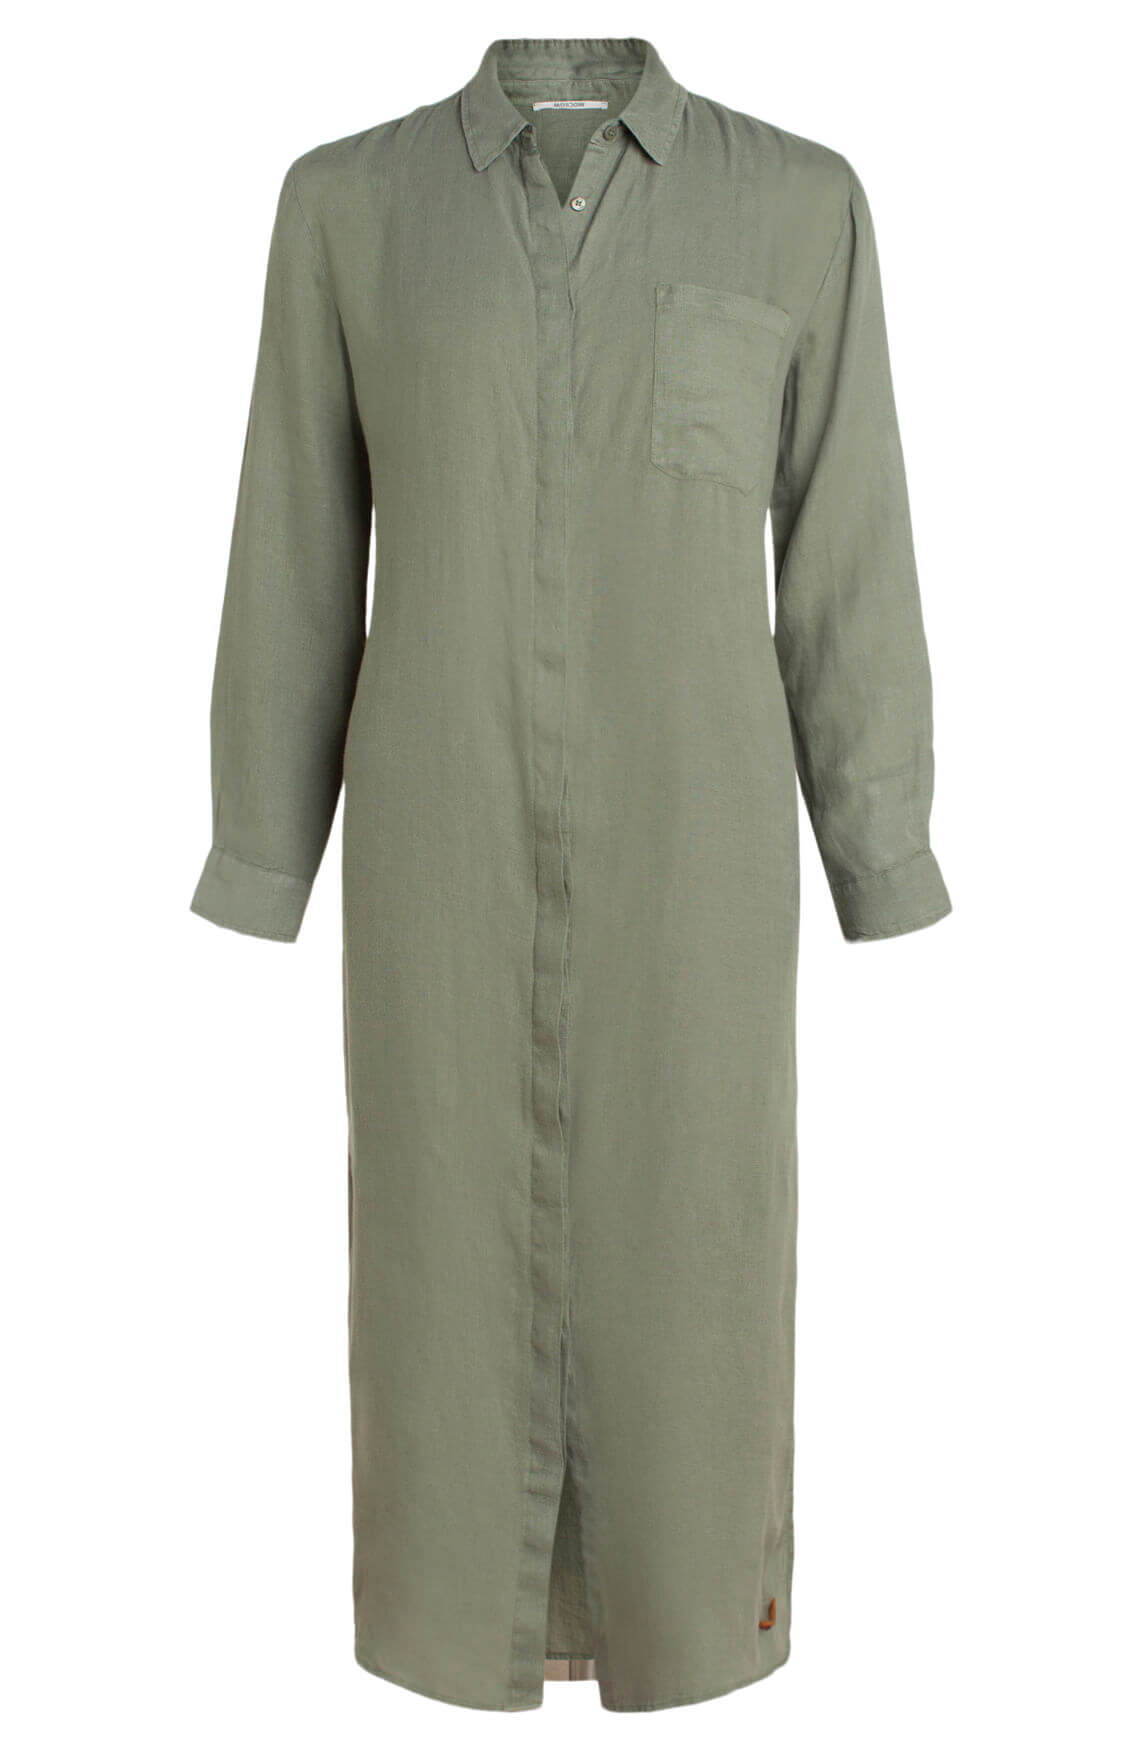 Moscow Dames Lange blousejurk groen